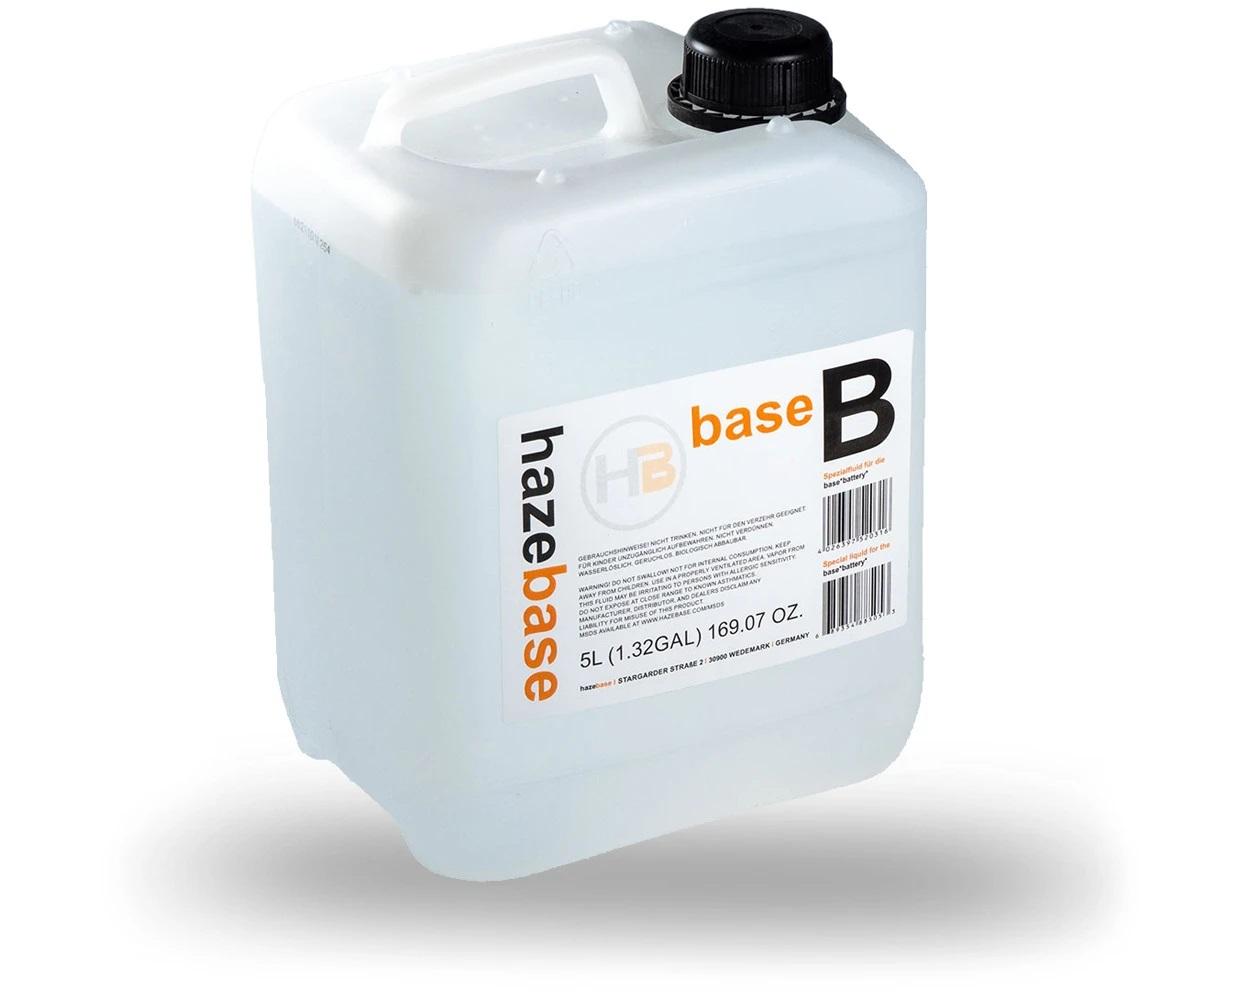 x-laser-hazebase-battery-fog-dluid-4.jpeg